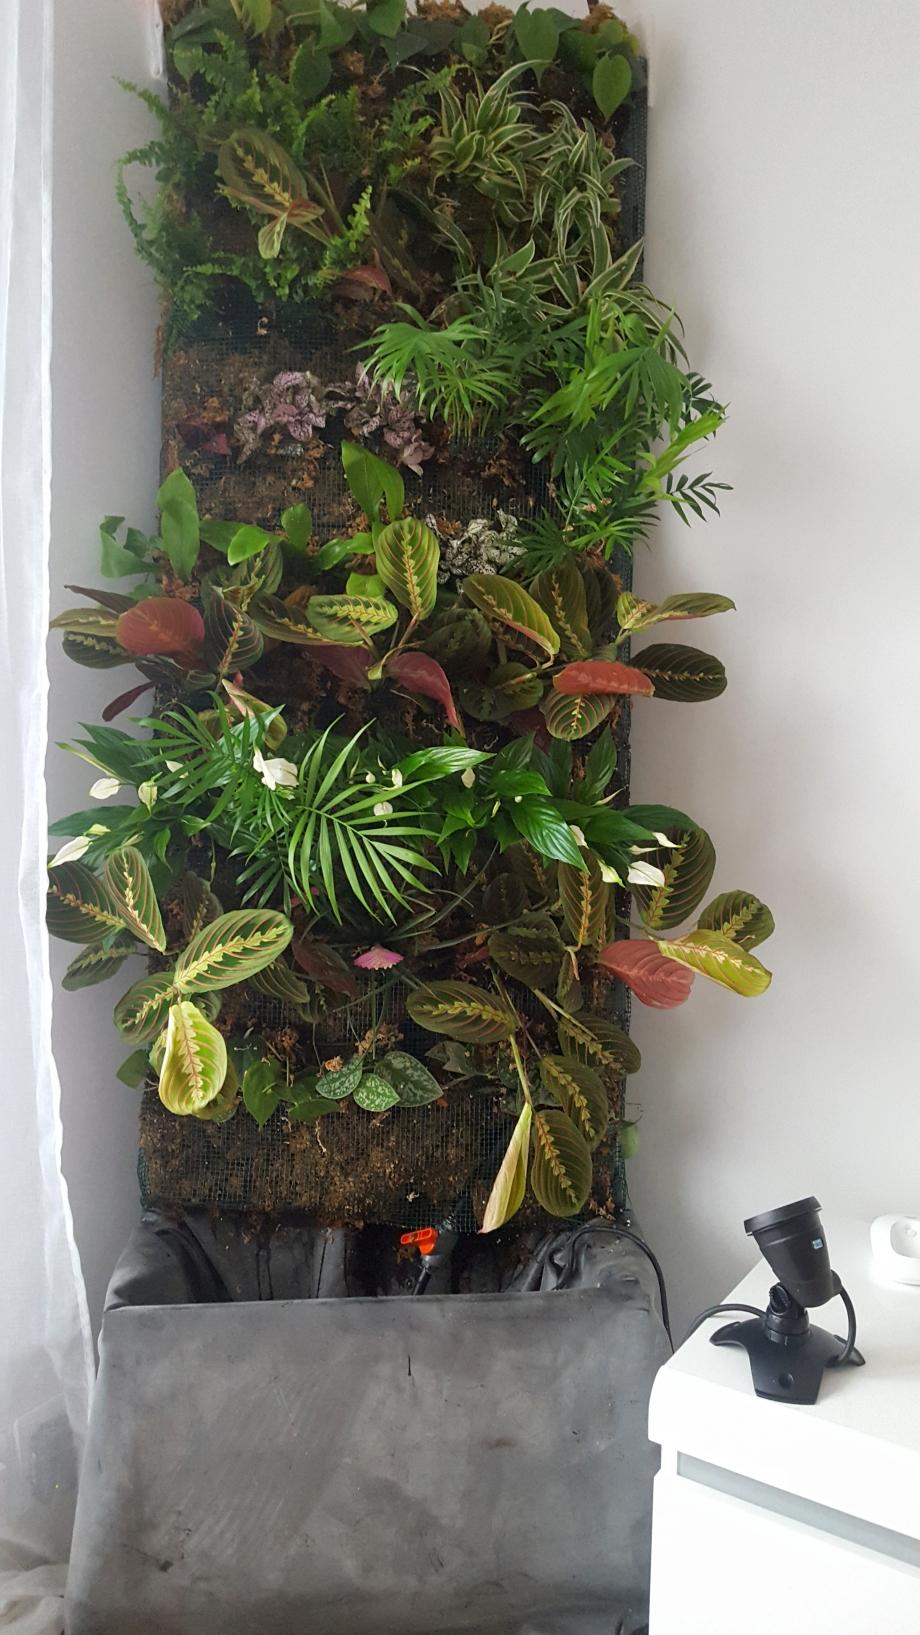 liste plants selon photo 4 mars 17.jpg